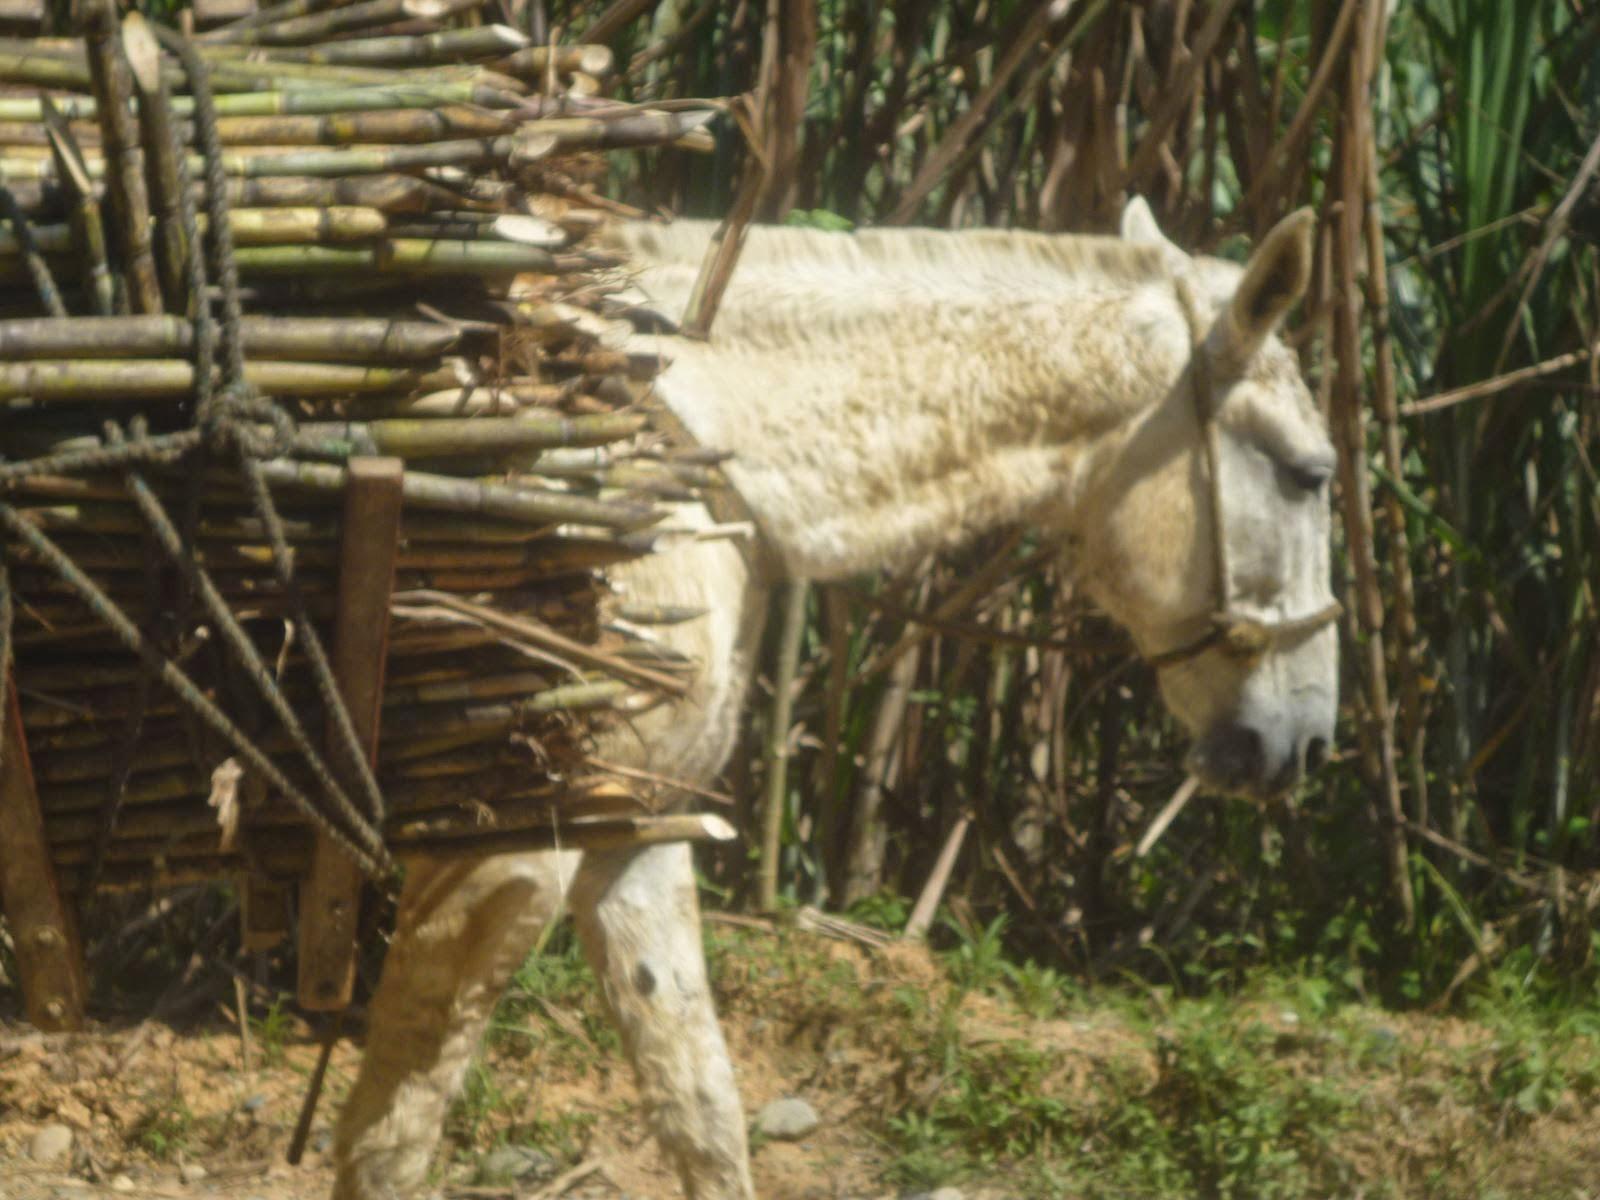 Animal de Tiro y Carga en Colombia caña de azucar